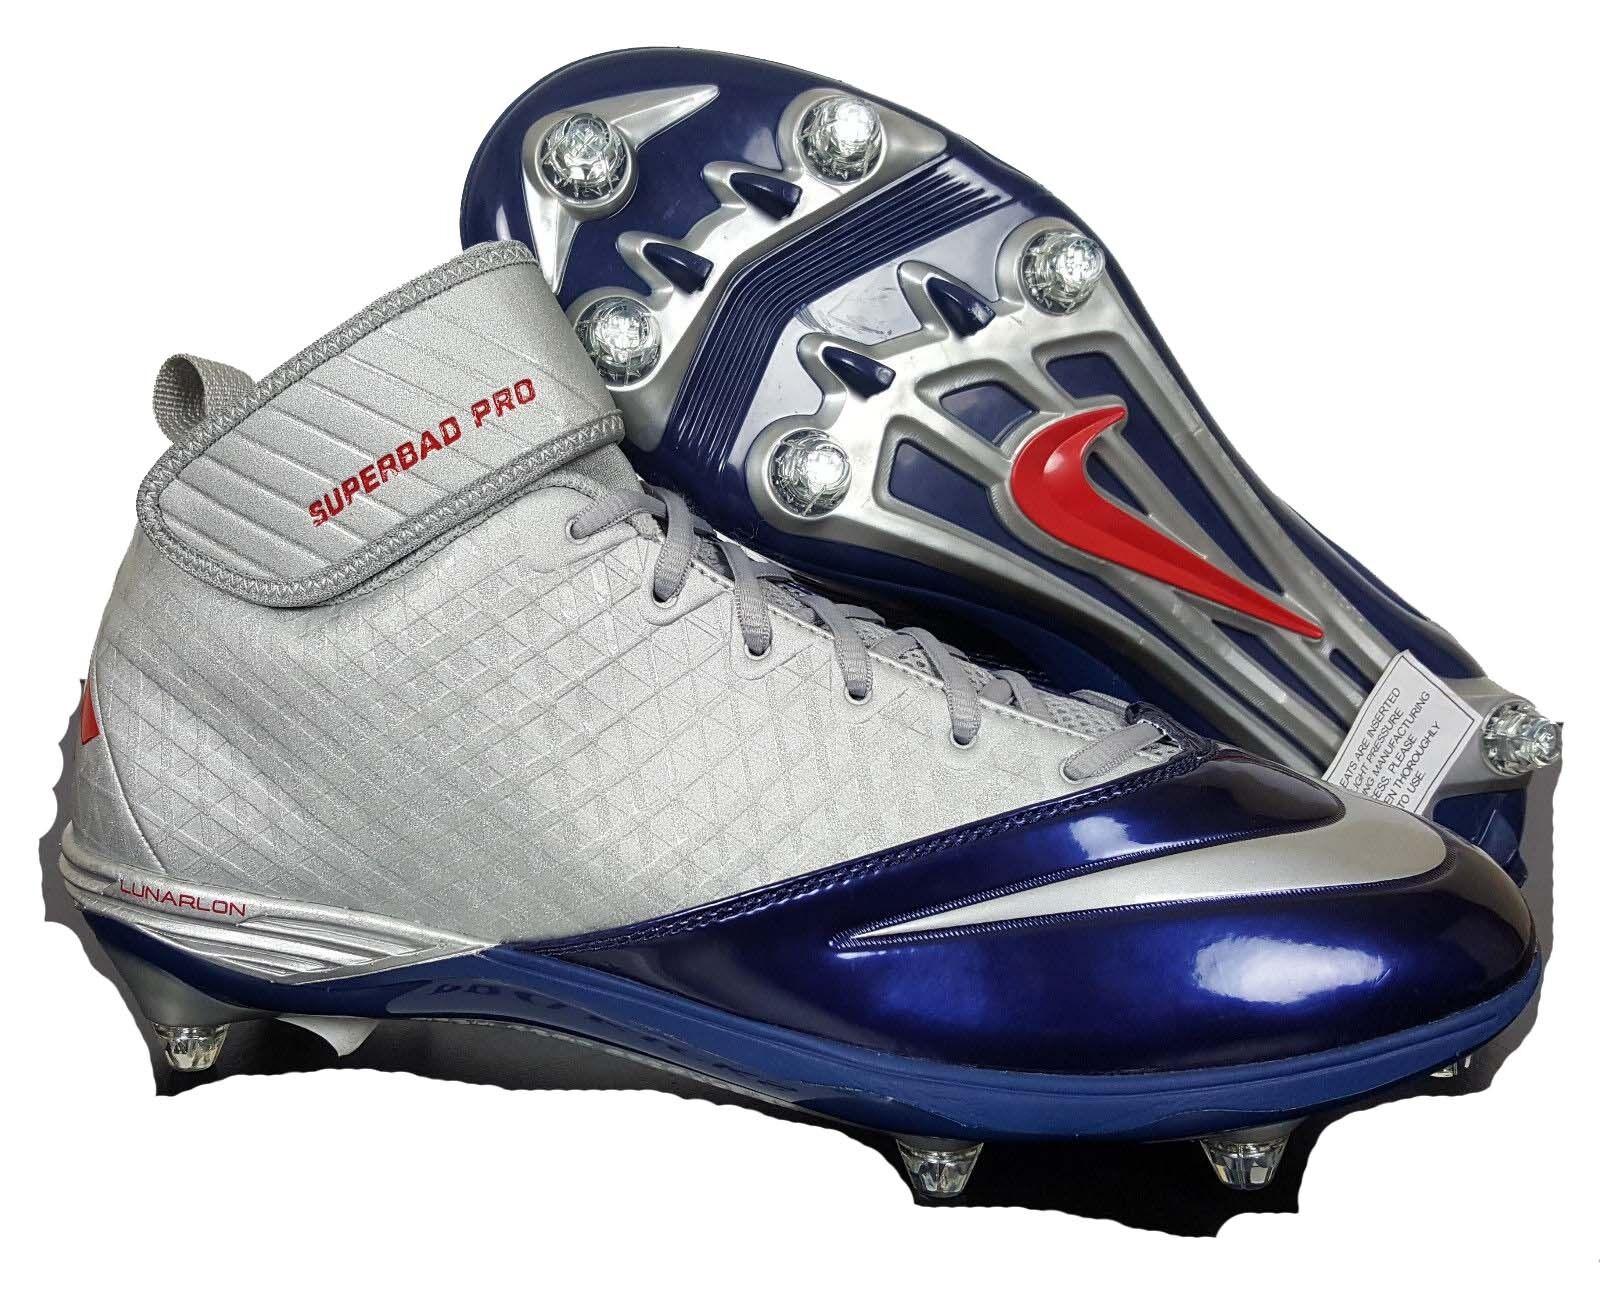 New Mens 14 NIKE Lunarlon Superbad Pro Patriots Cleats shoes  544762-019